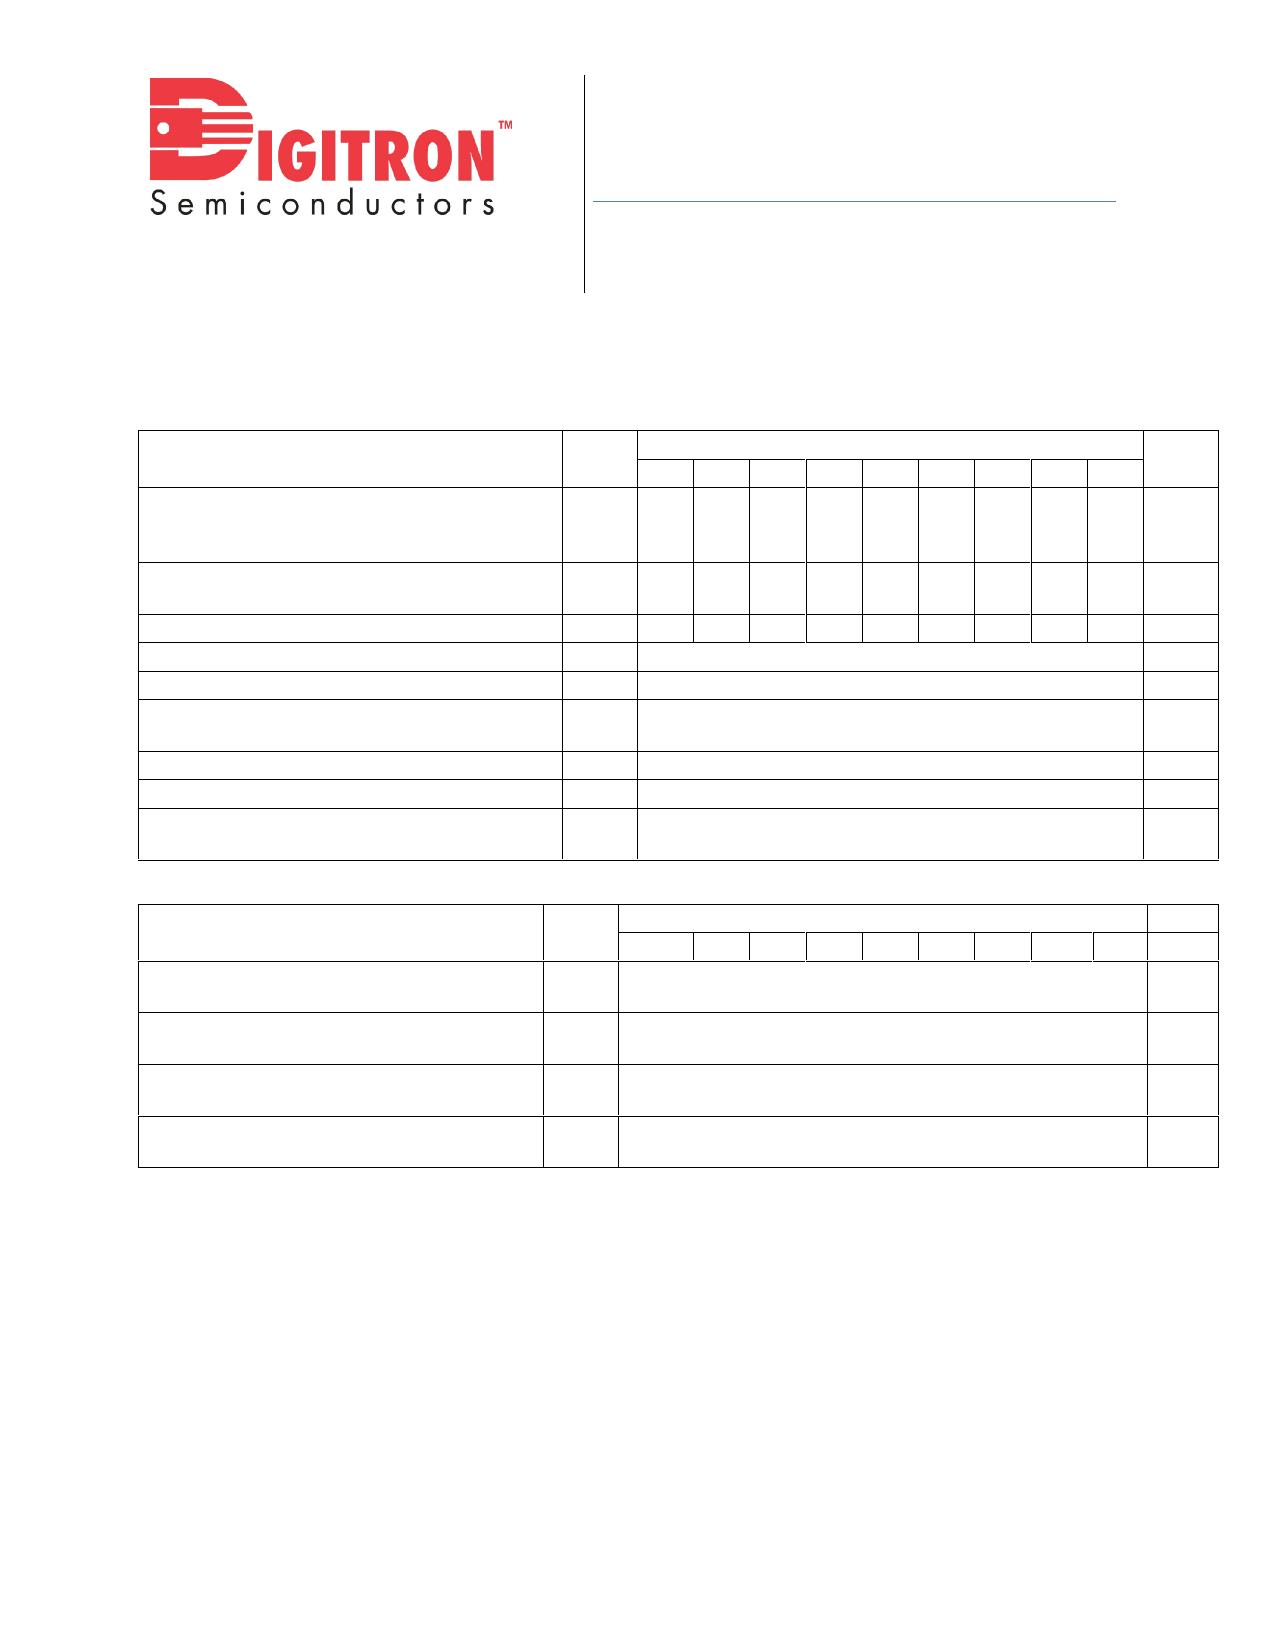 MR1126 데이터시트 및 MR1126 PDF